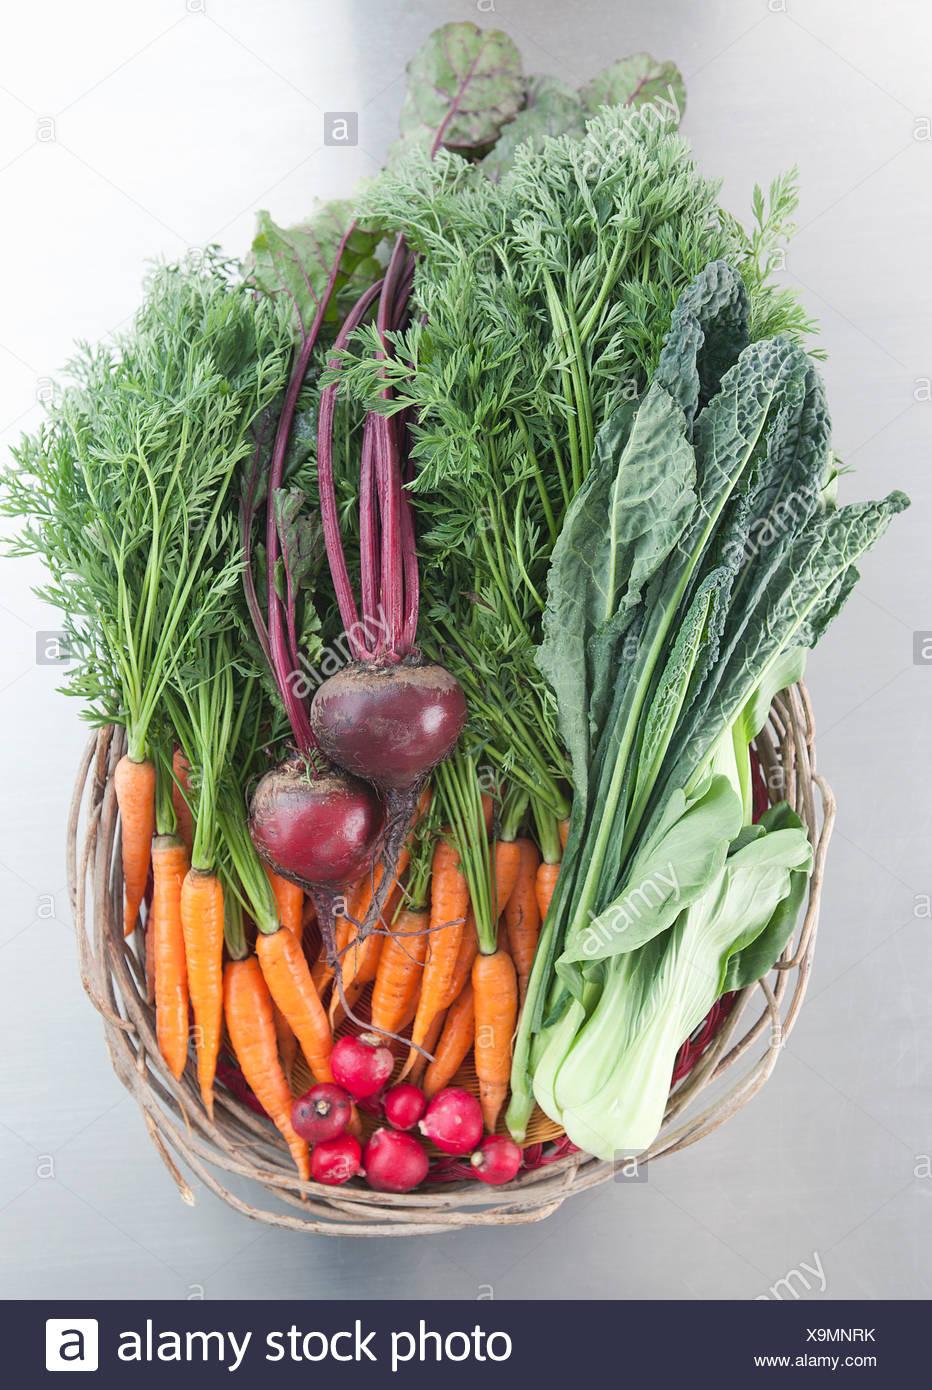 Cesta de verduras frescas Imagen De Stock